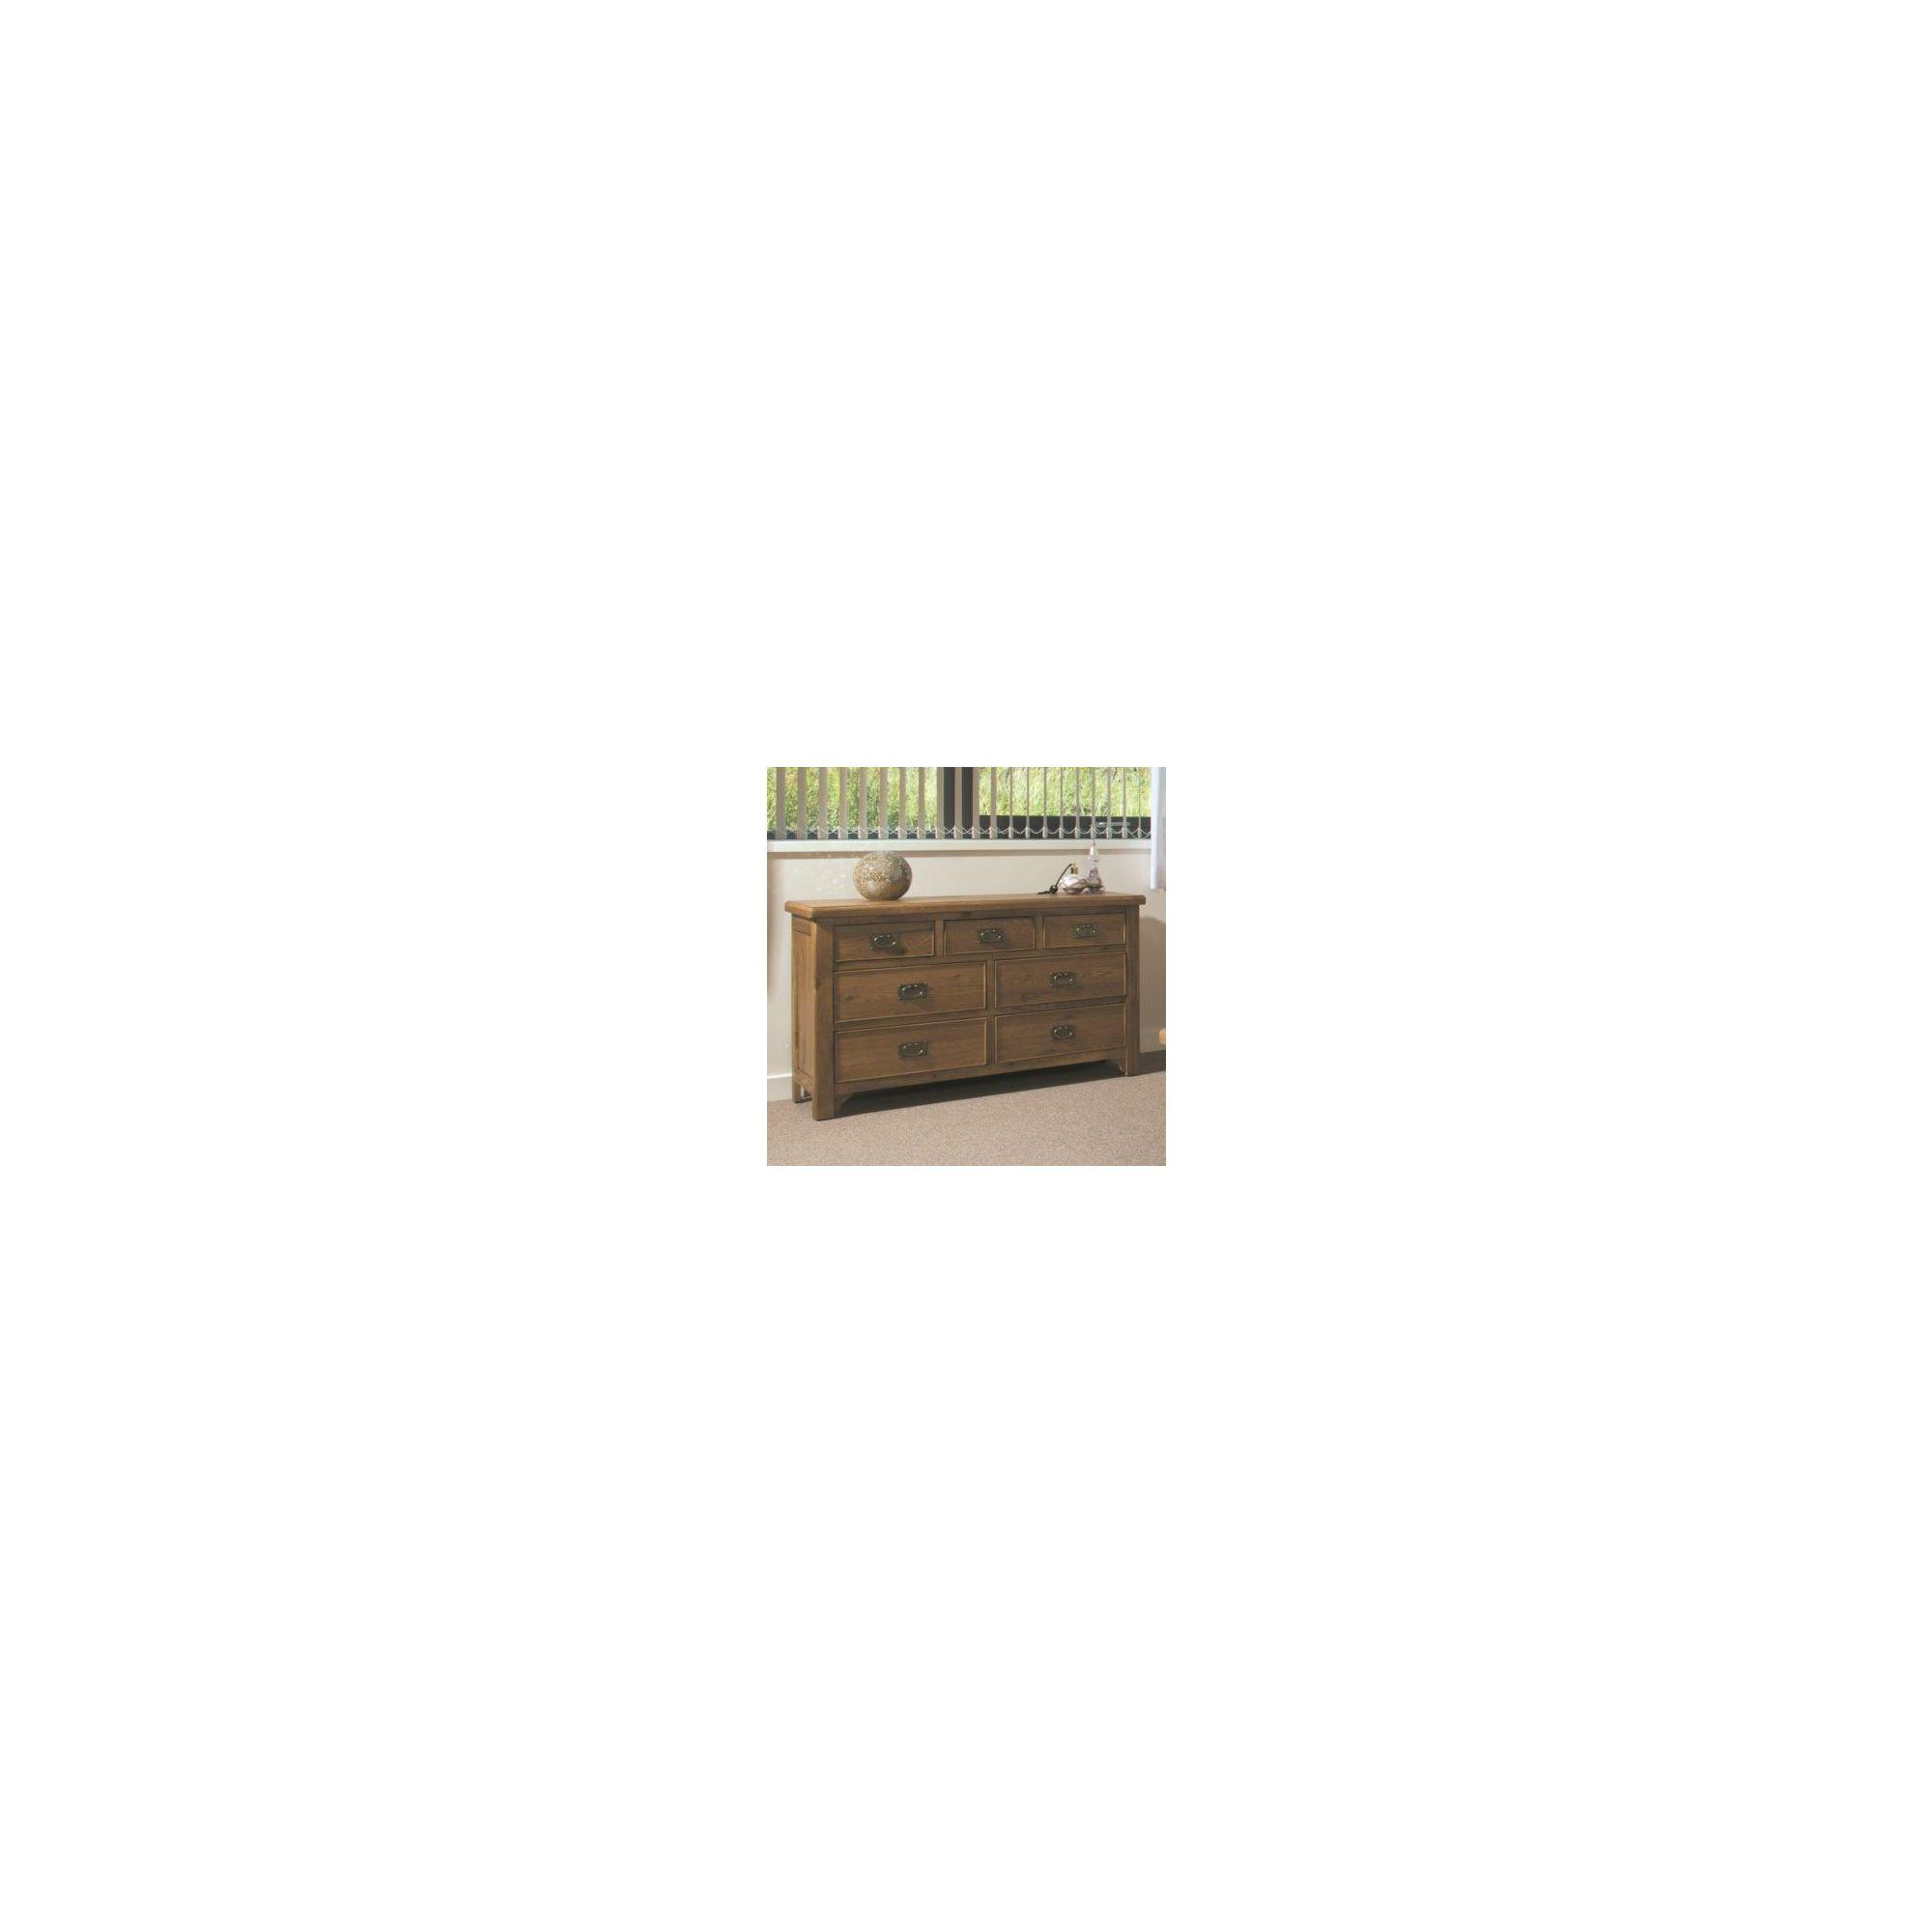 Kelburn Furniture Marino Rustic Oak 3 over 4 Drawer Chest at Tesco Direct